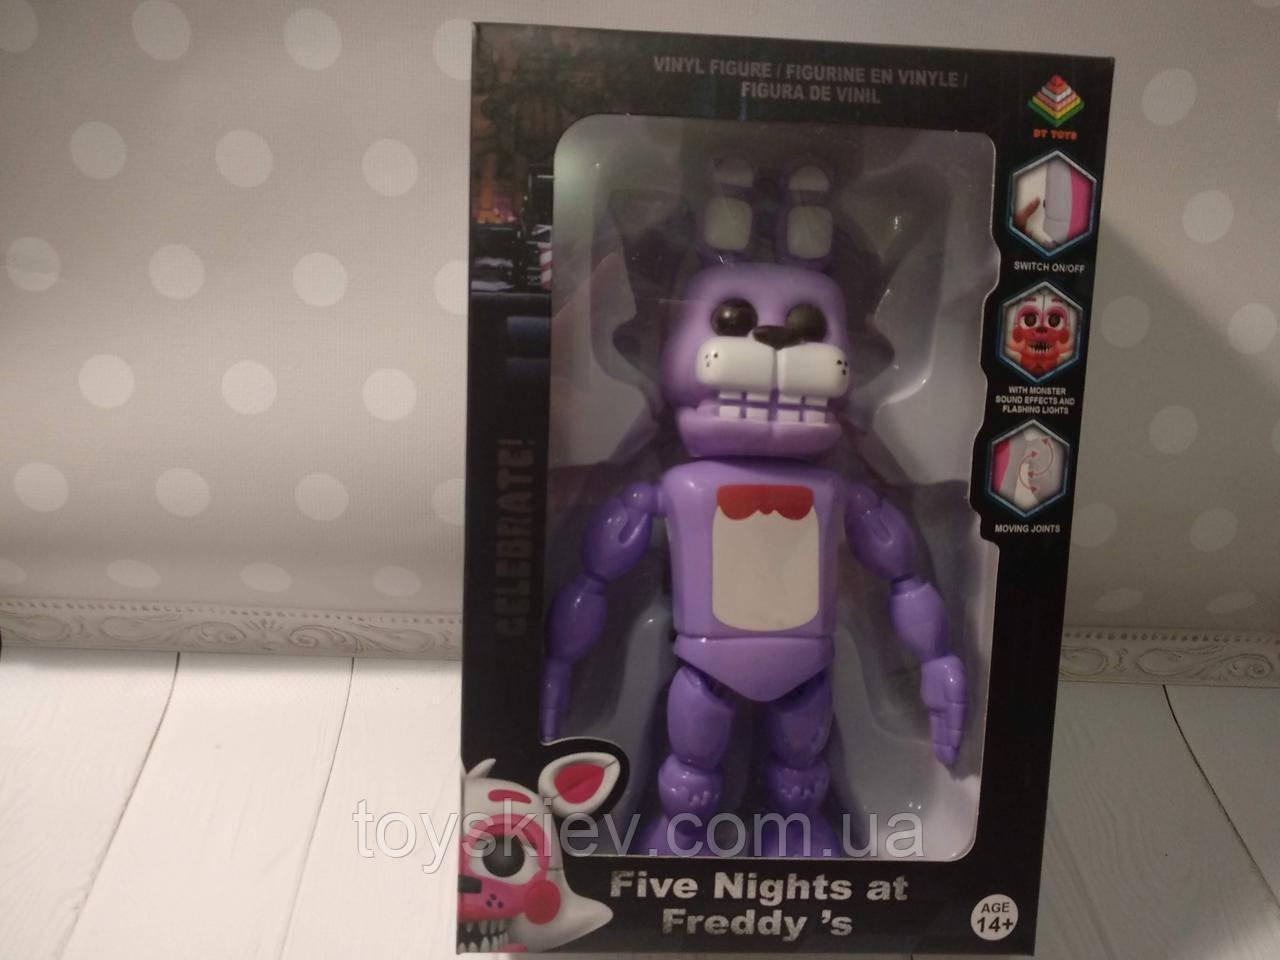 Игрушки 5 пять ночей с Фредди, Bonnie / Funko Five Nights at Freddy's, Freddy N6 свет, звук.